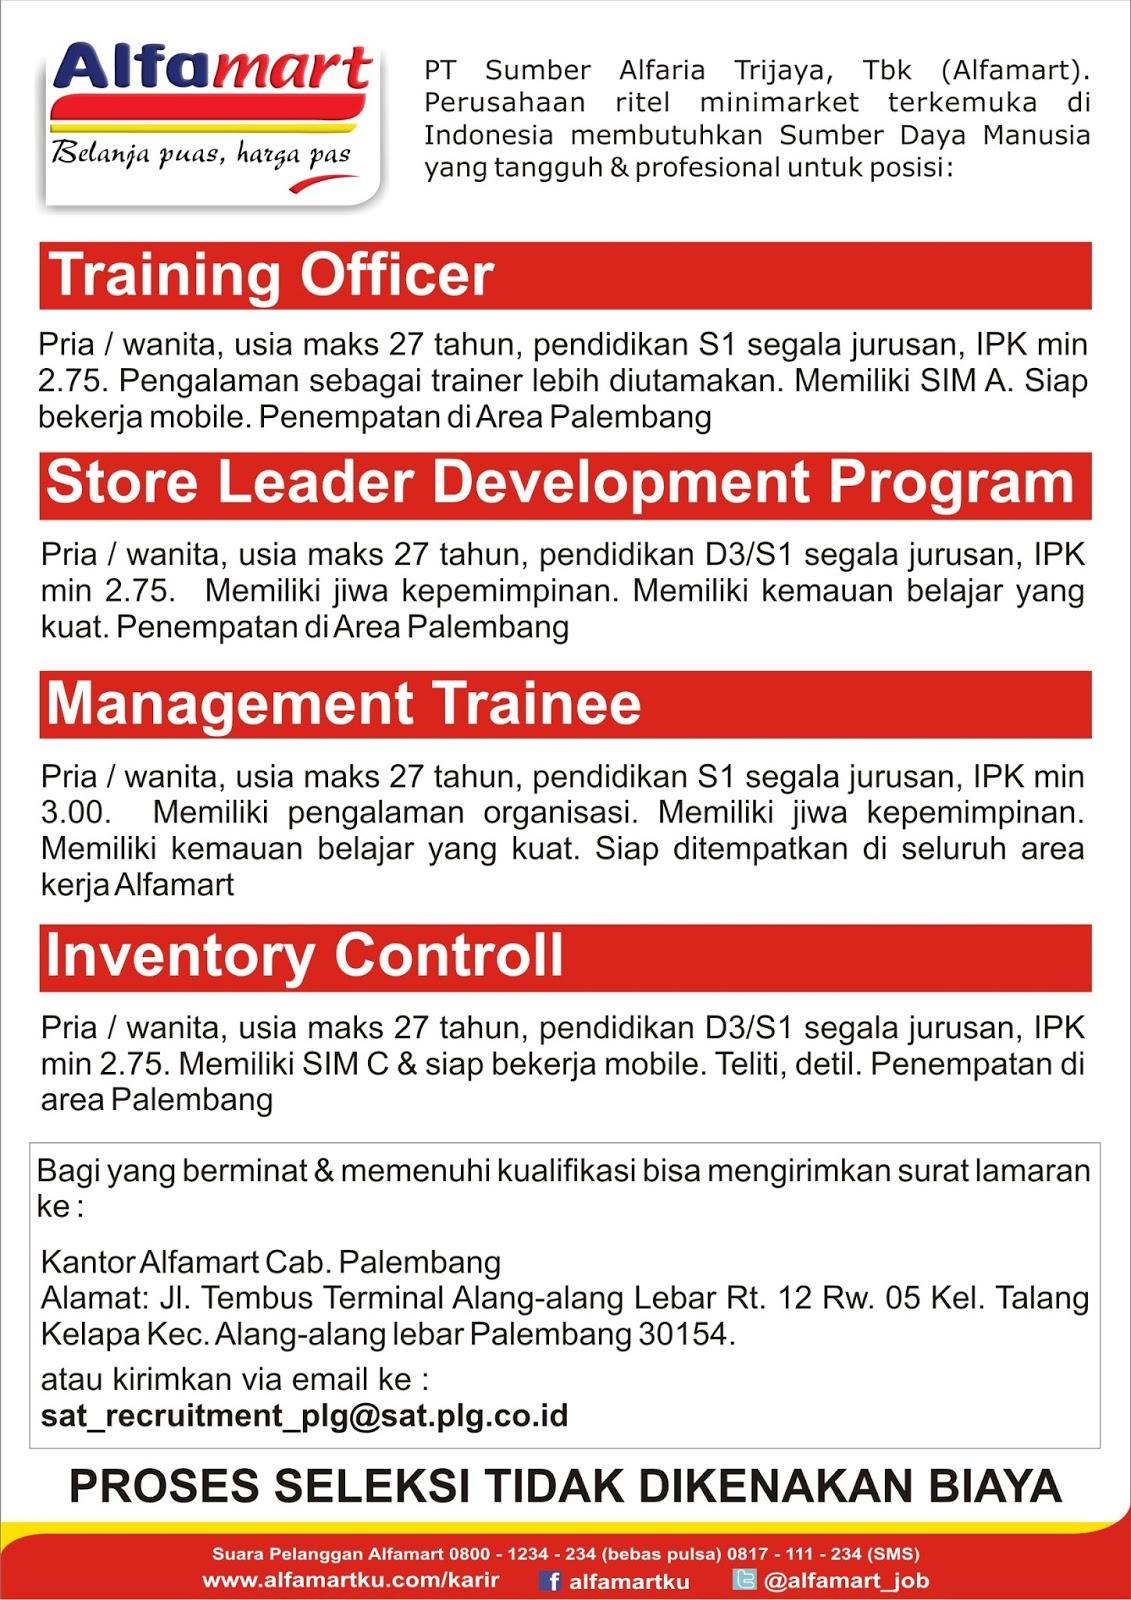 LOWONGAN ALFAMART: Lowongan Alfamart Palembang